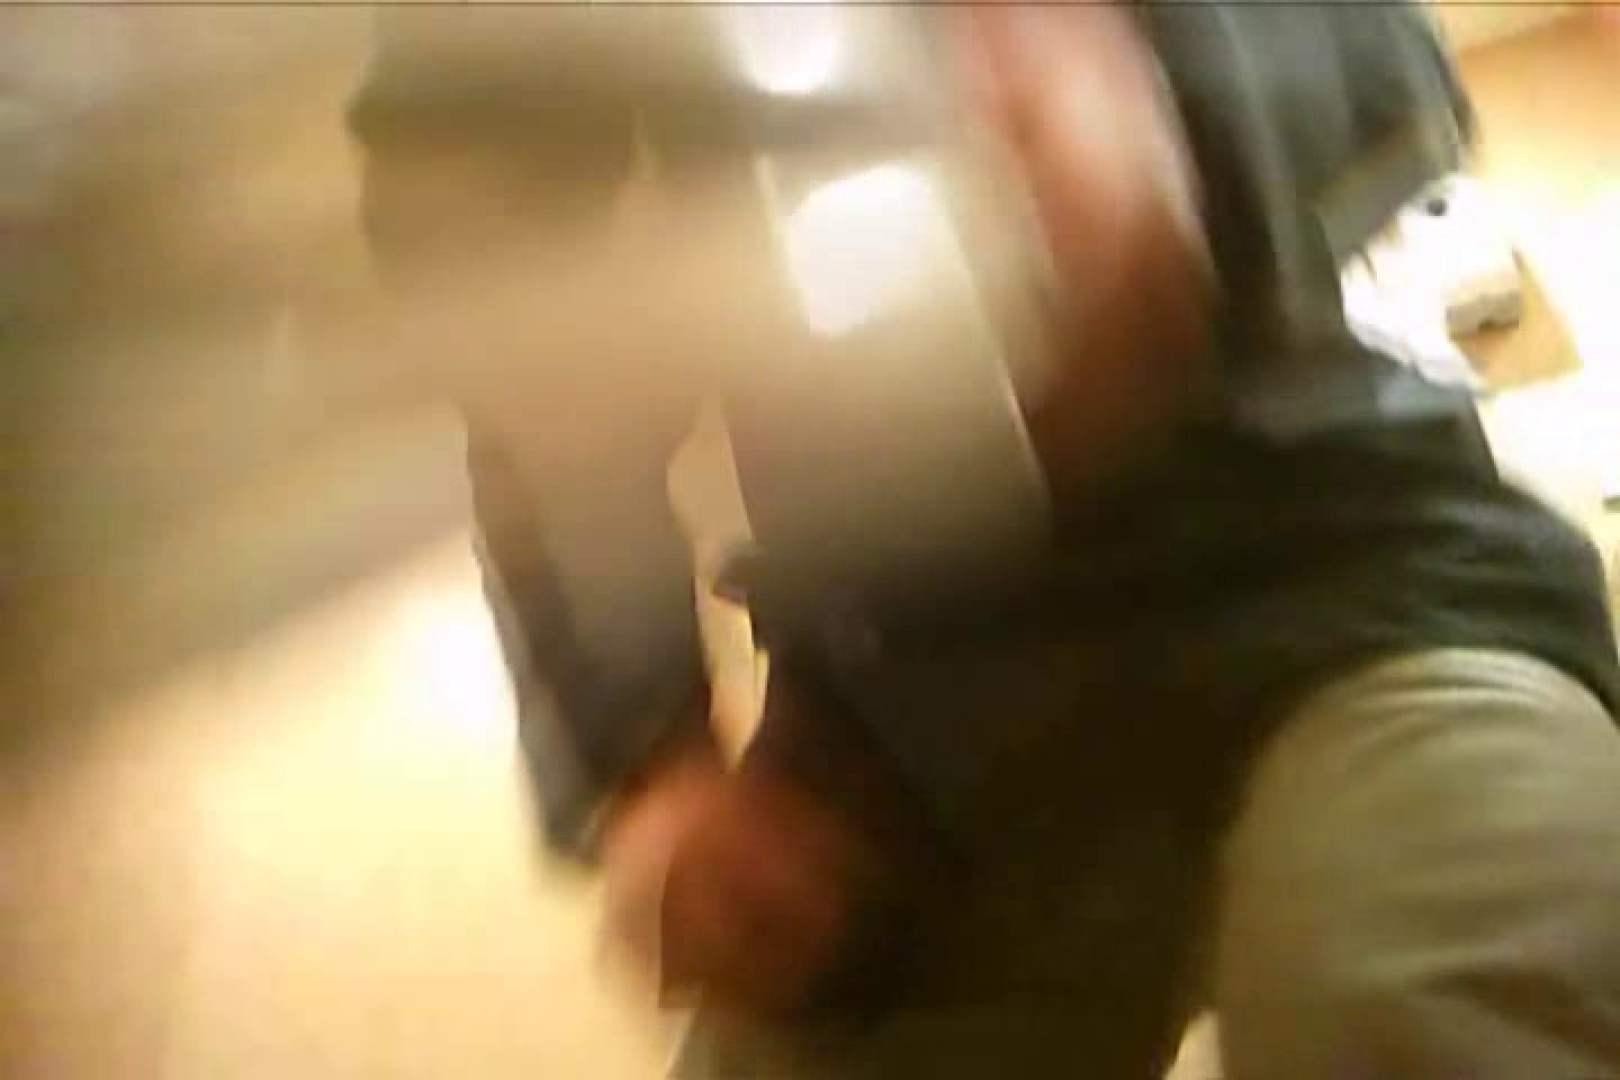 Gボーイ初投稿!掴み取りさんの洗面所覗き!in新幹線!VOL19 私服がかっこいい ゲイエロビデオ画像 92枚 10